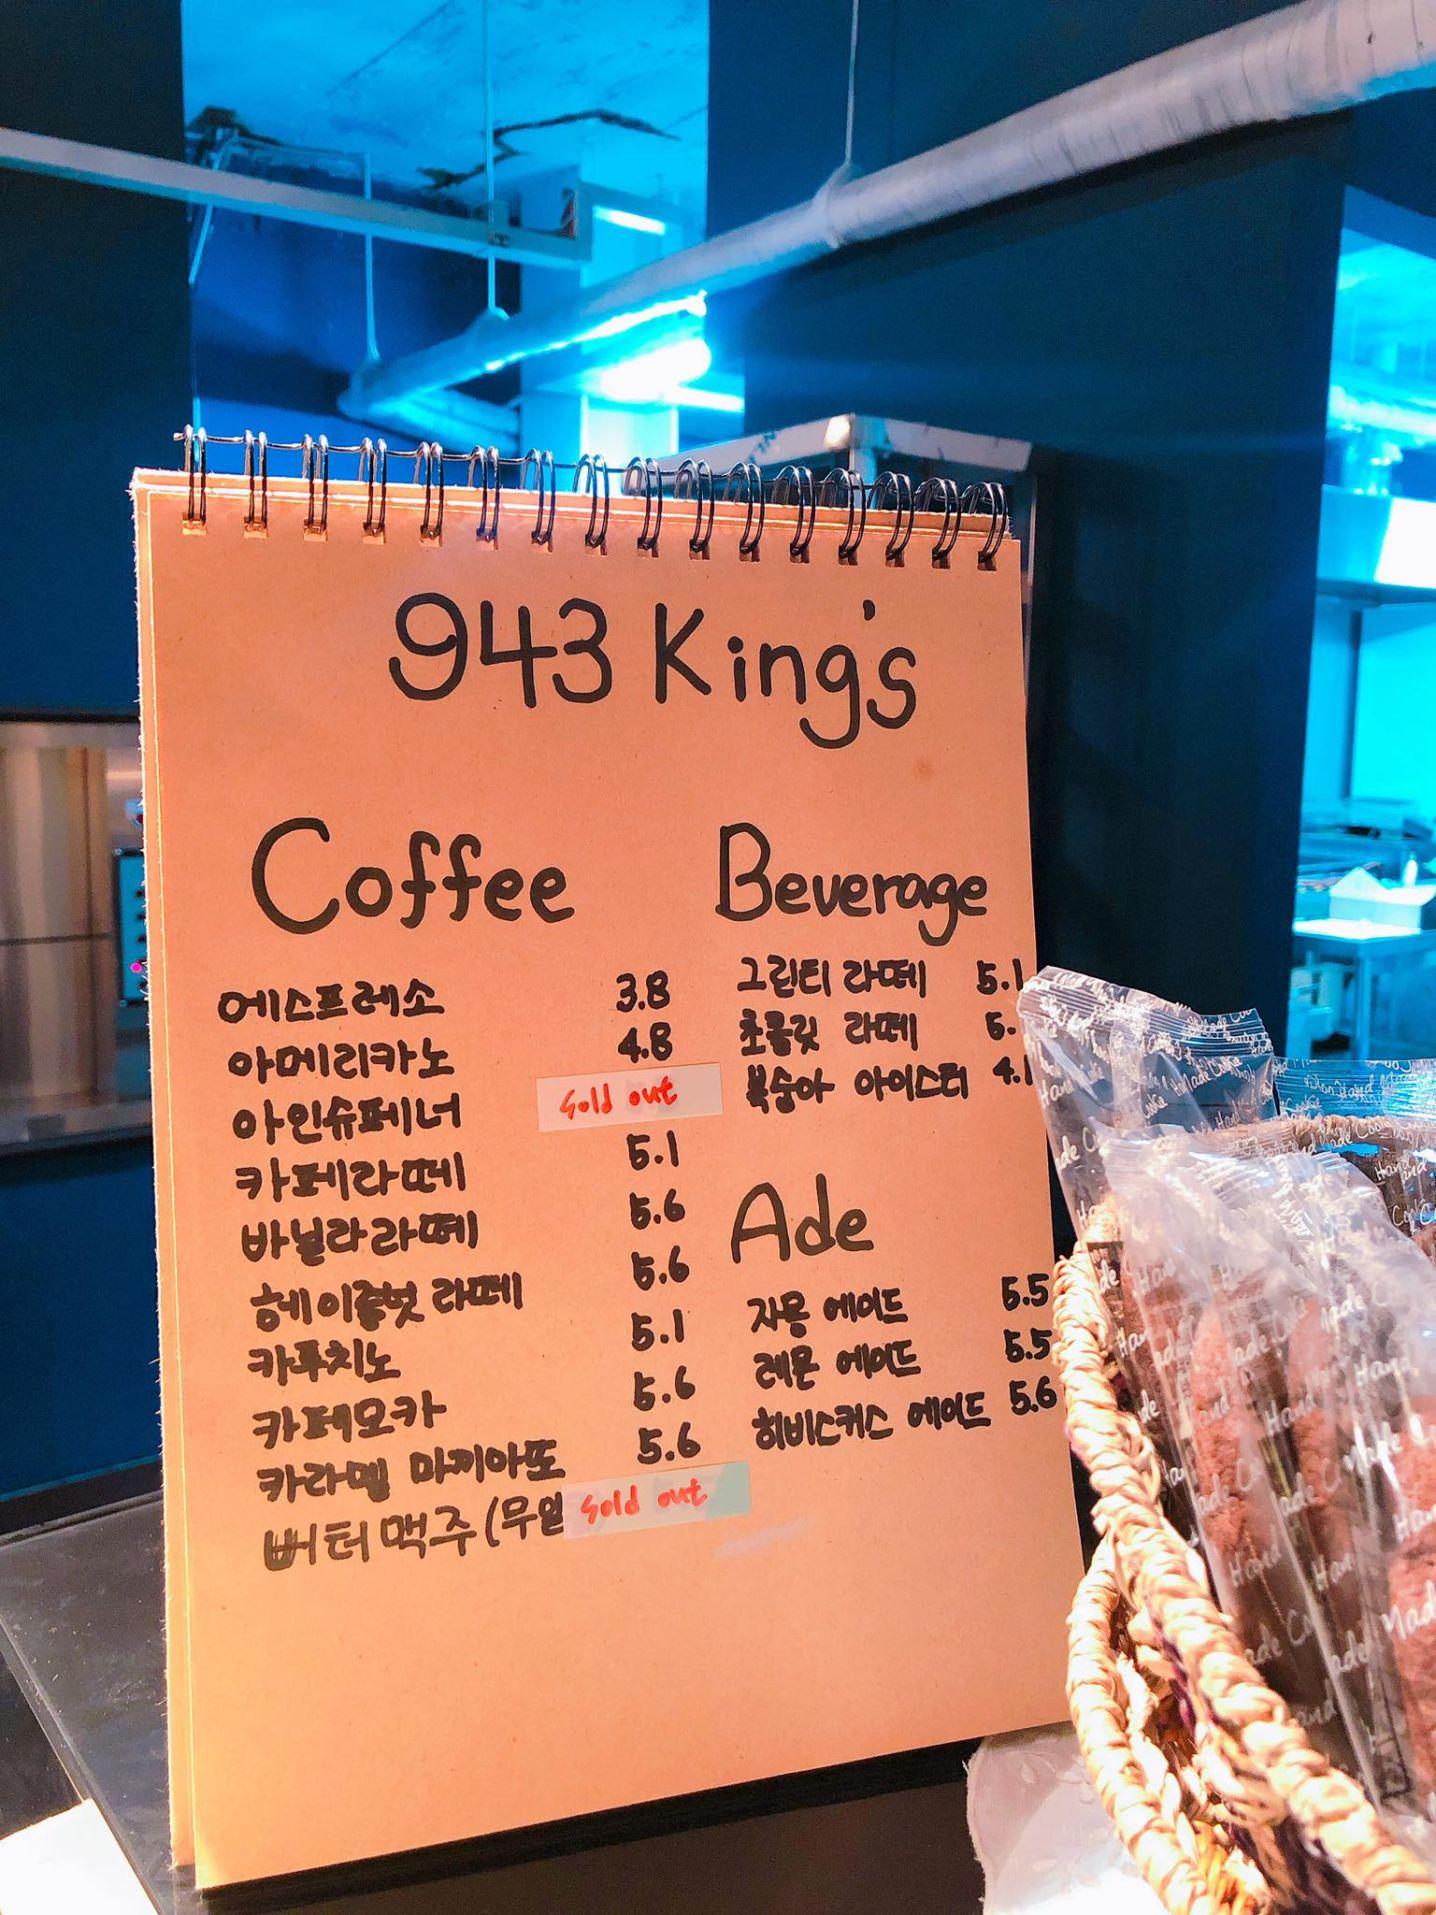 hanquoc_943-kings-cross-harry-potter-cafe-08